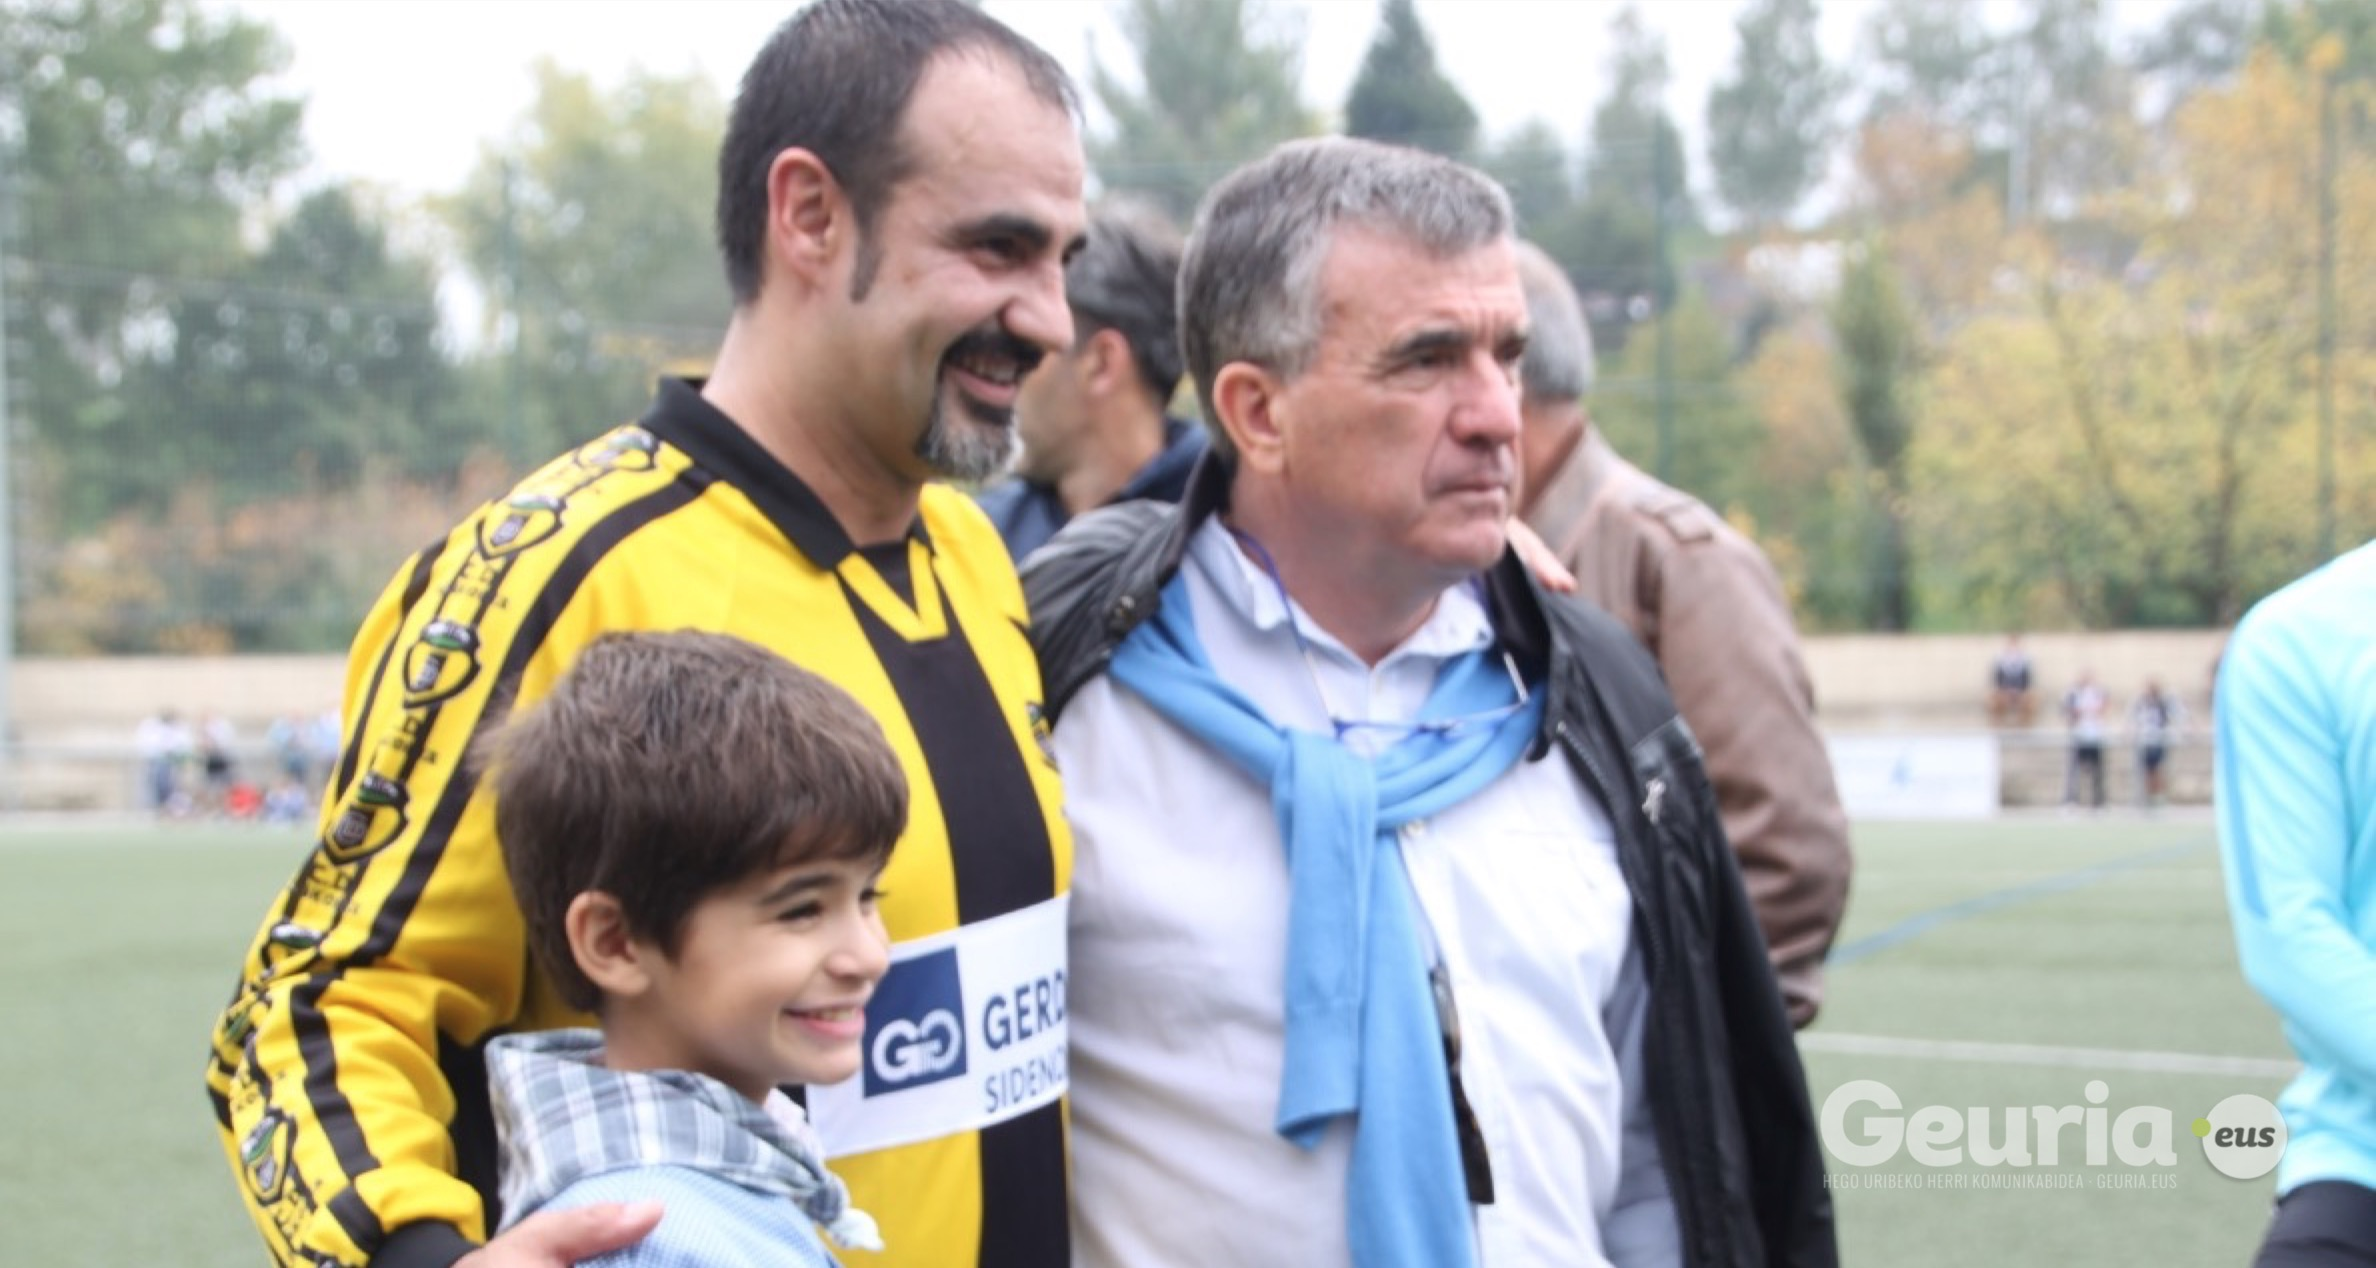 basauri_san_fausto_2015_futbol_basconia_beteranoak_20